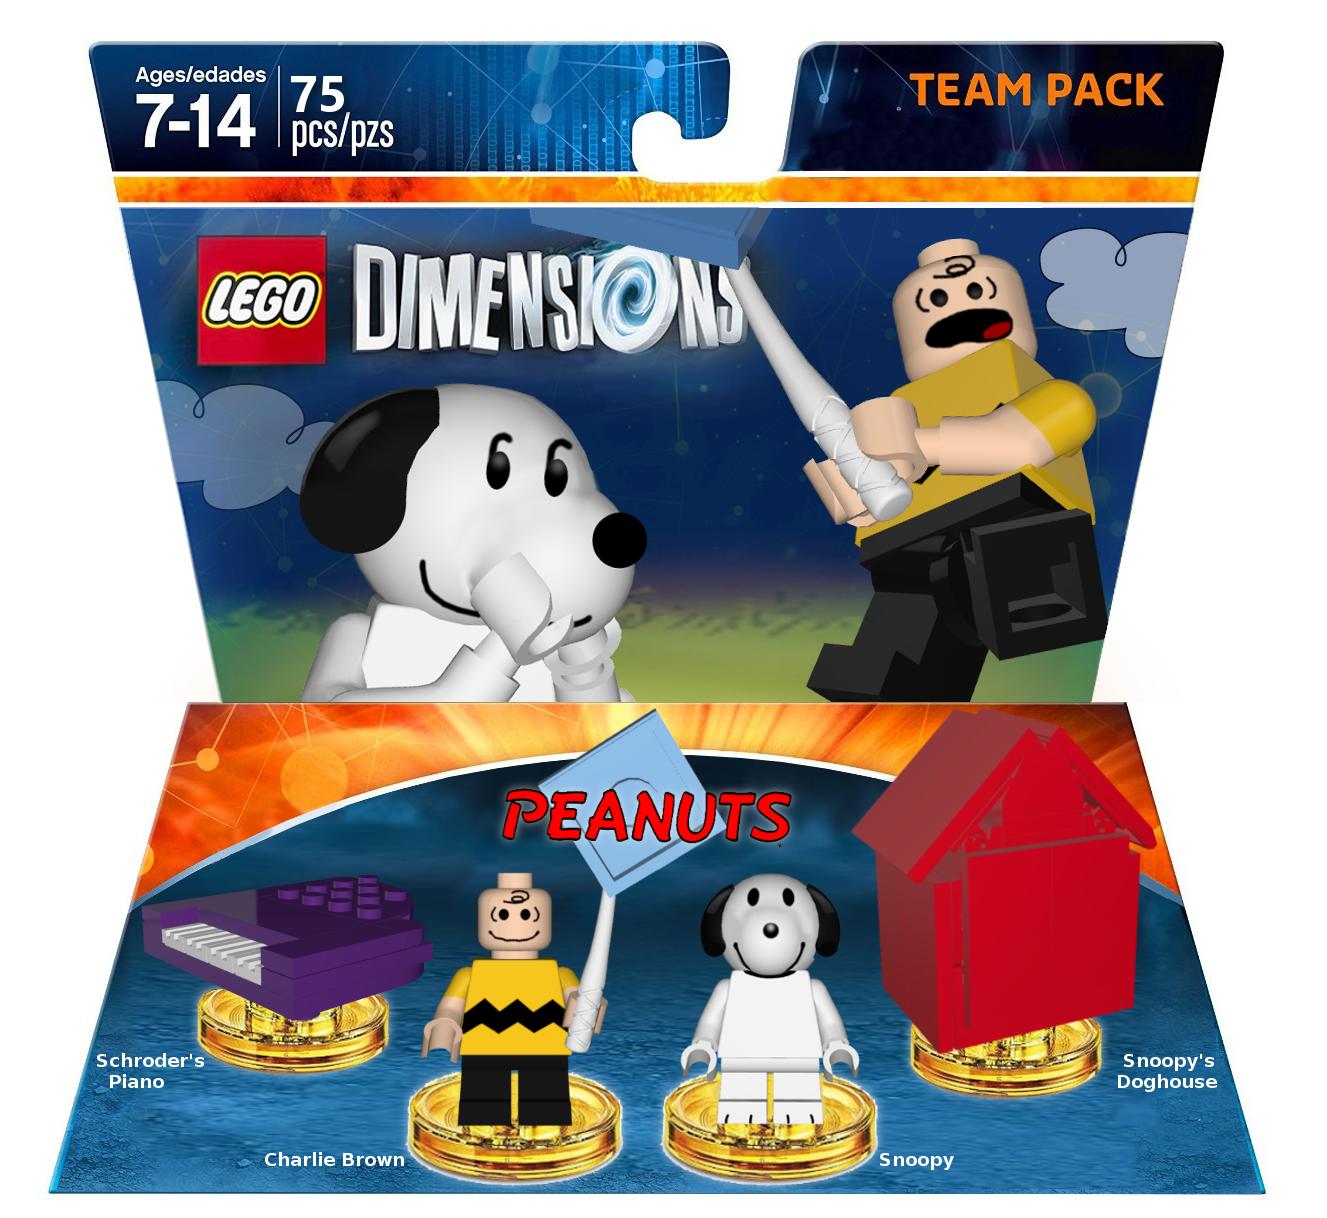 Peanuts Team Pack Npgcole LEGO Dimensions Customs